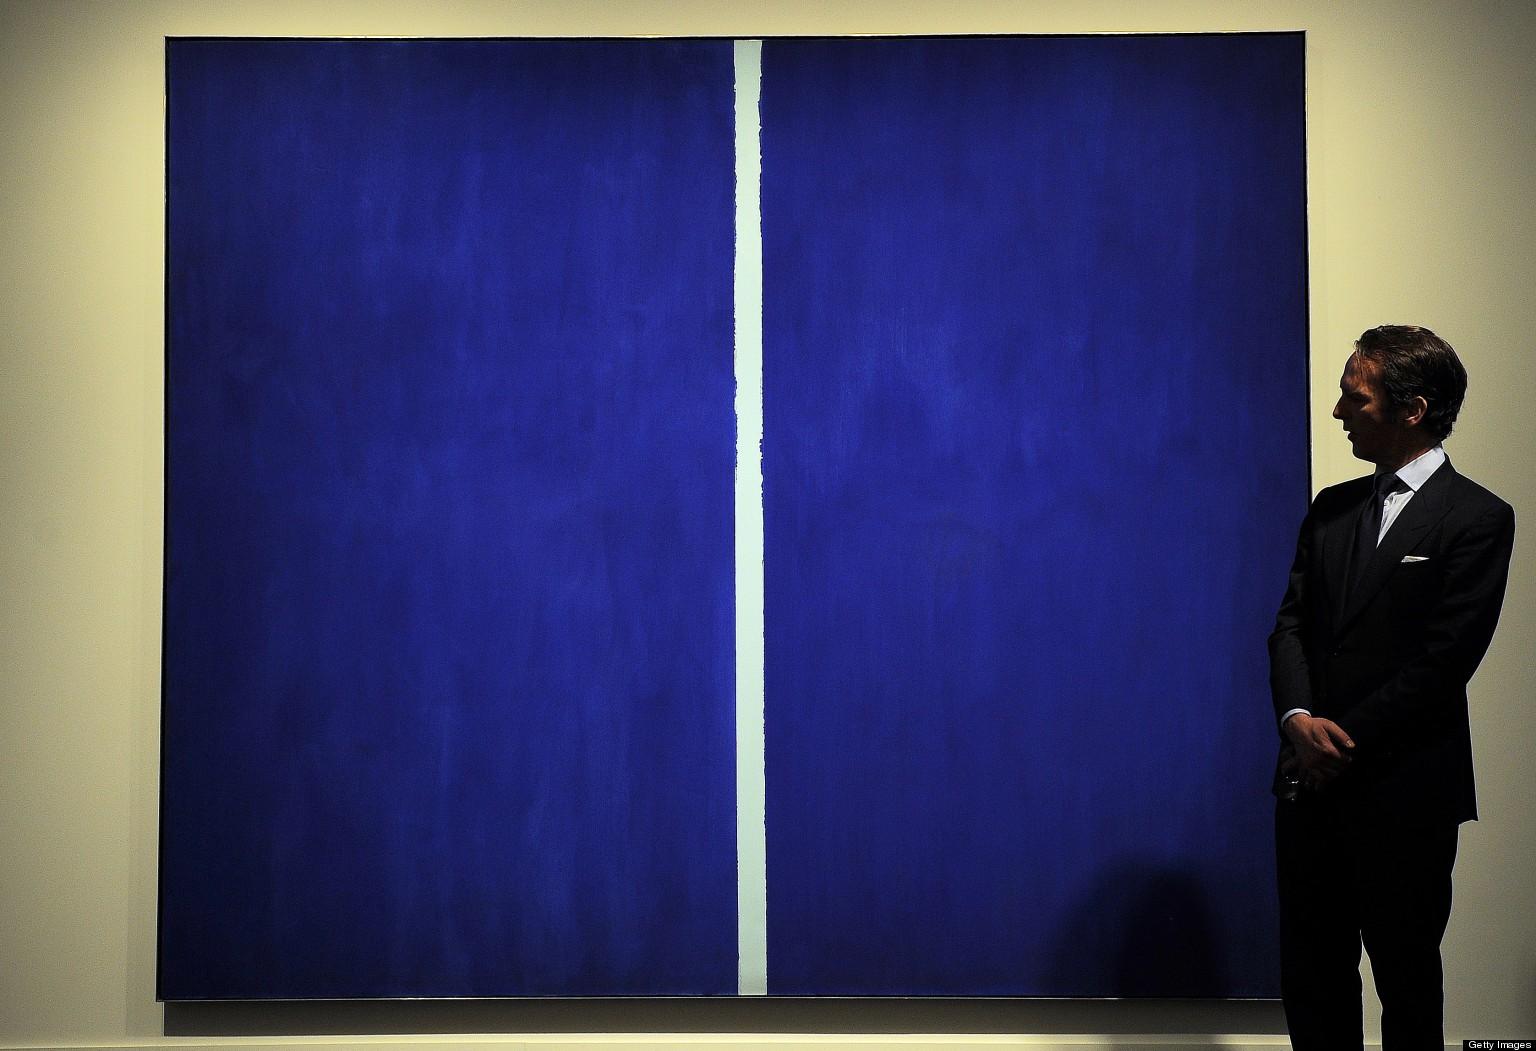 Blue Painting Worth Millions